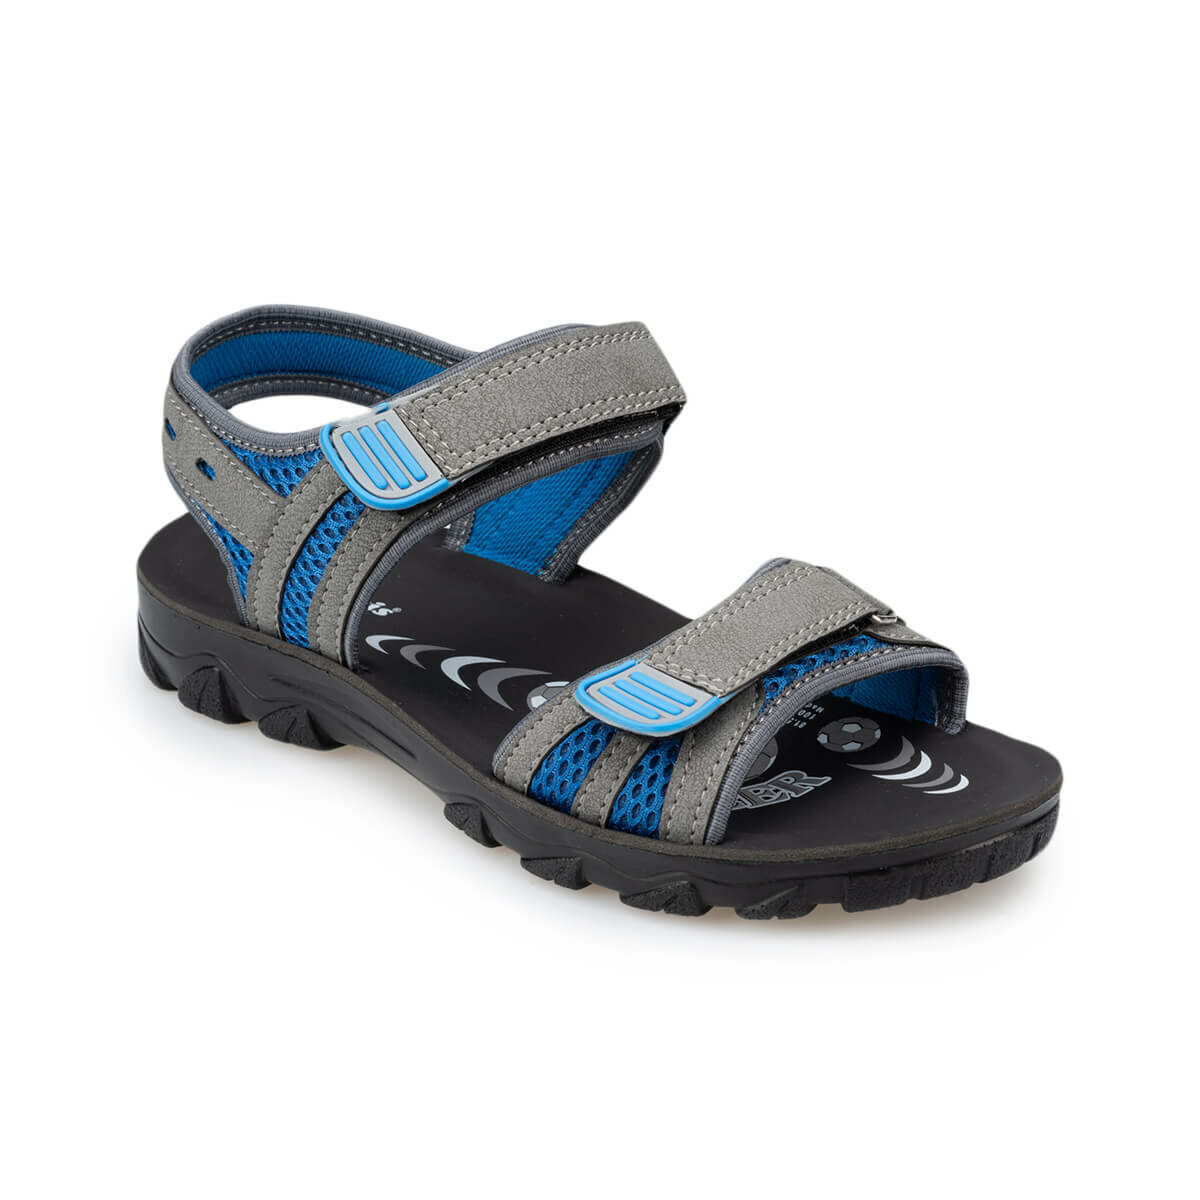 FLO 91. 510358.G Gray Male Child Sandals Polaris